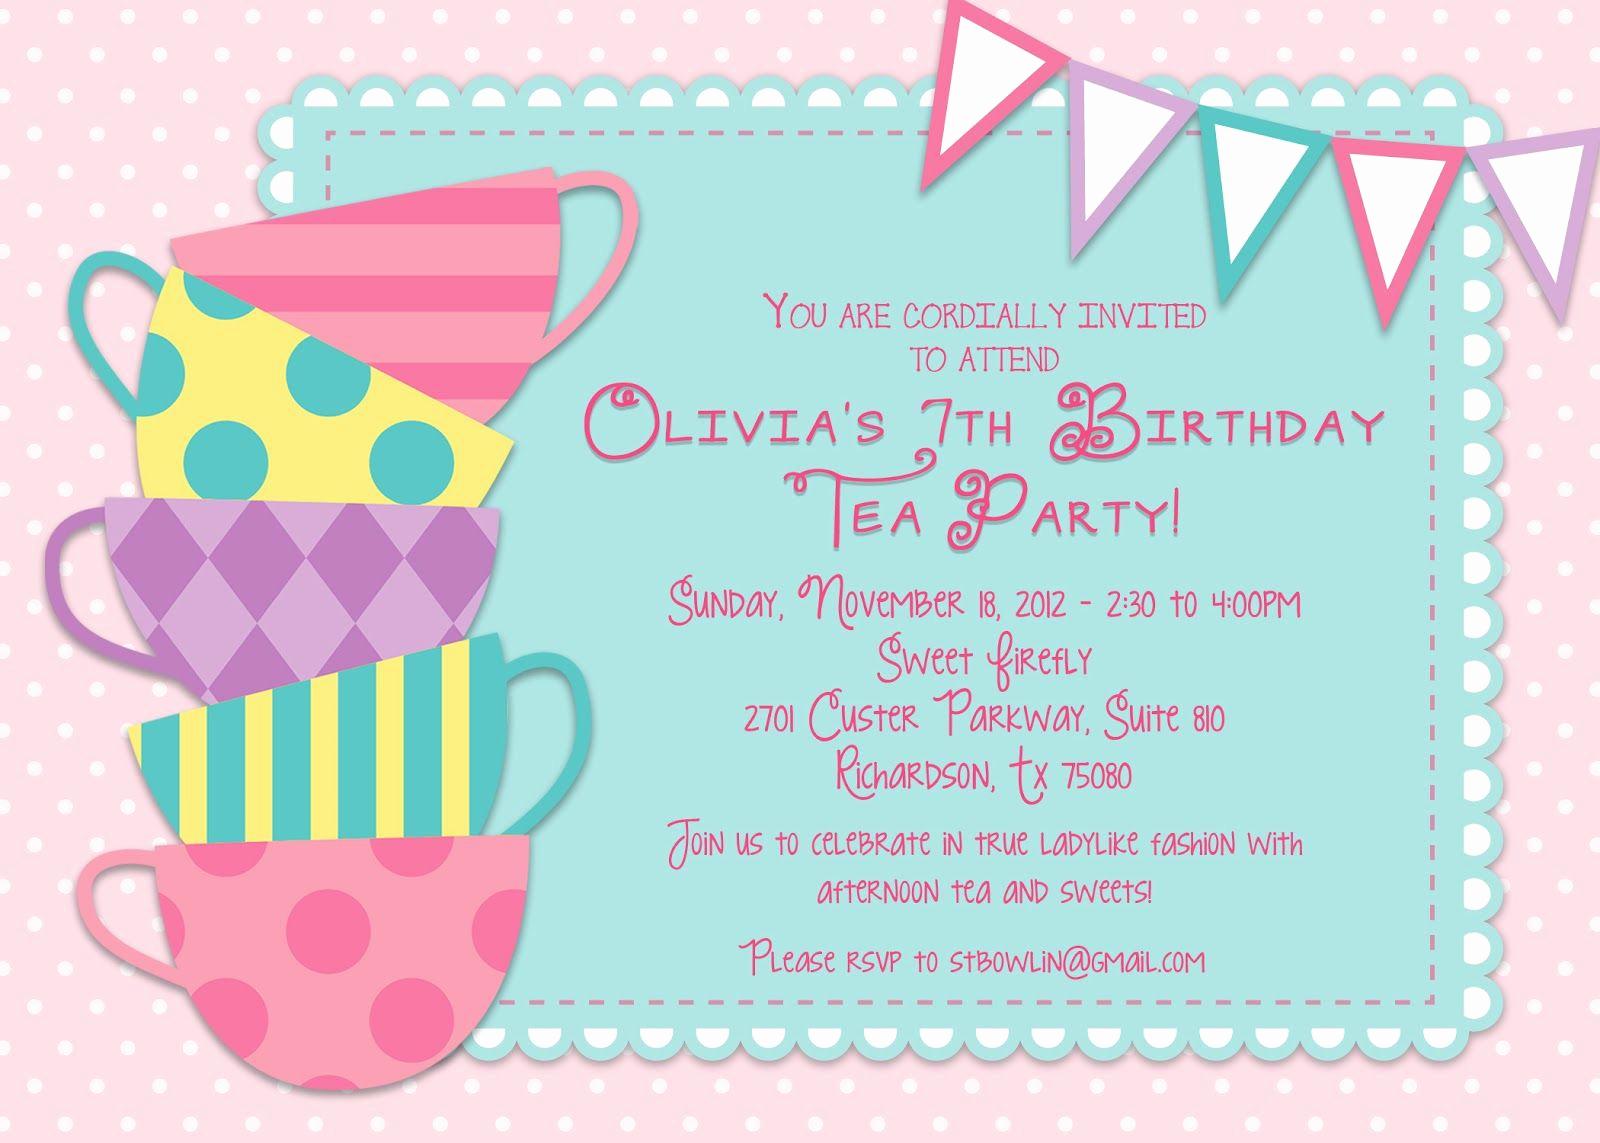 Tea Party Invitations Templates Beautiful Kids Tea Party Invitations Tea Party Pinterest